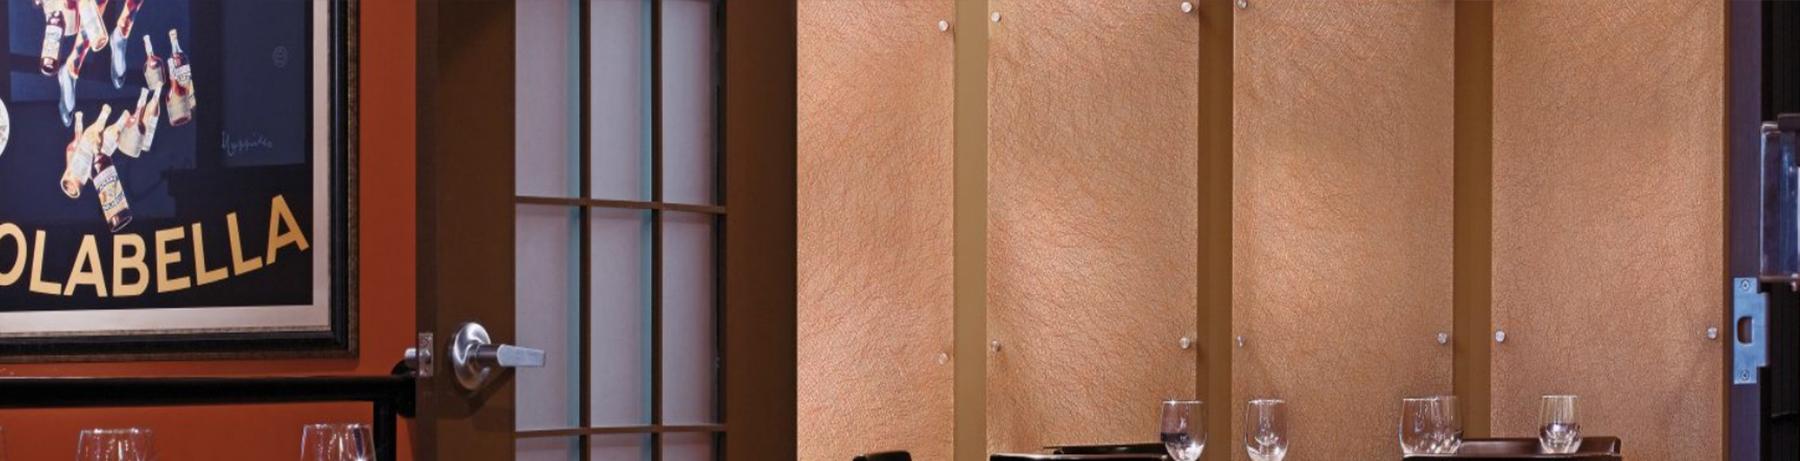 Acoustical Walls - Translucent Wall Panels